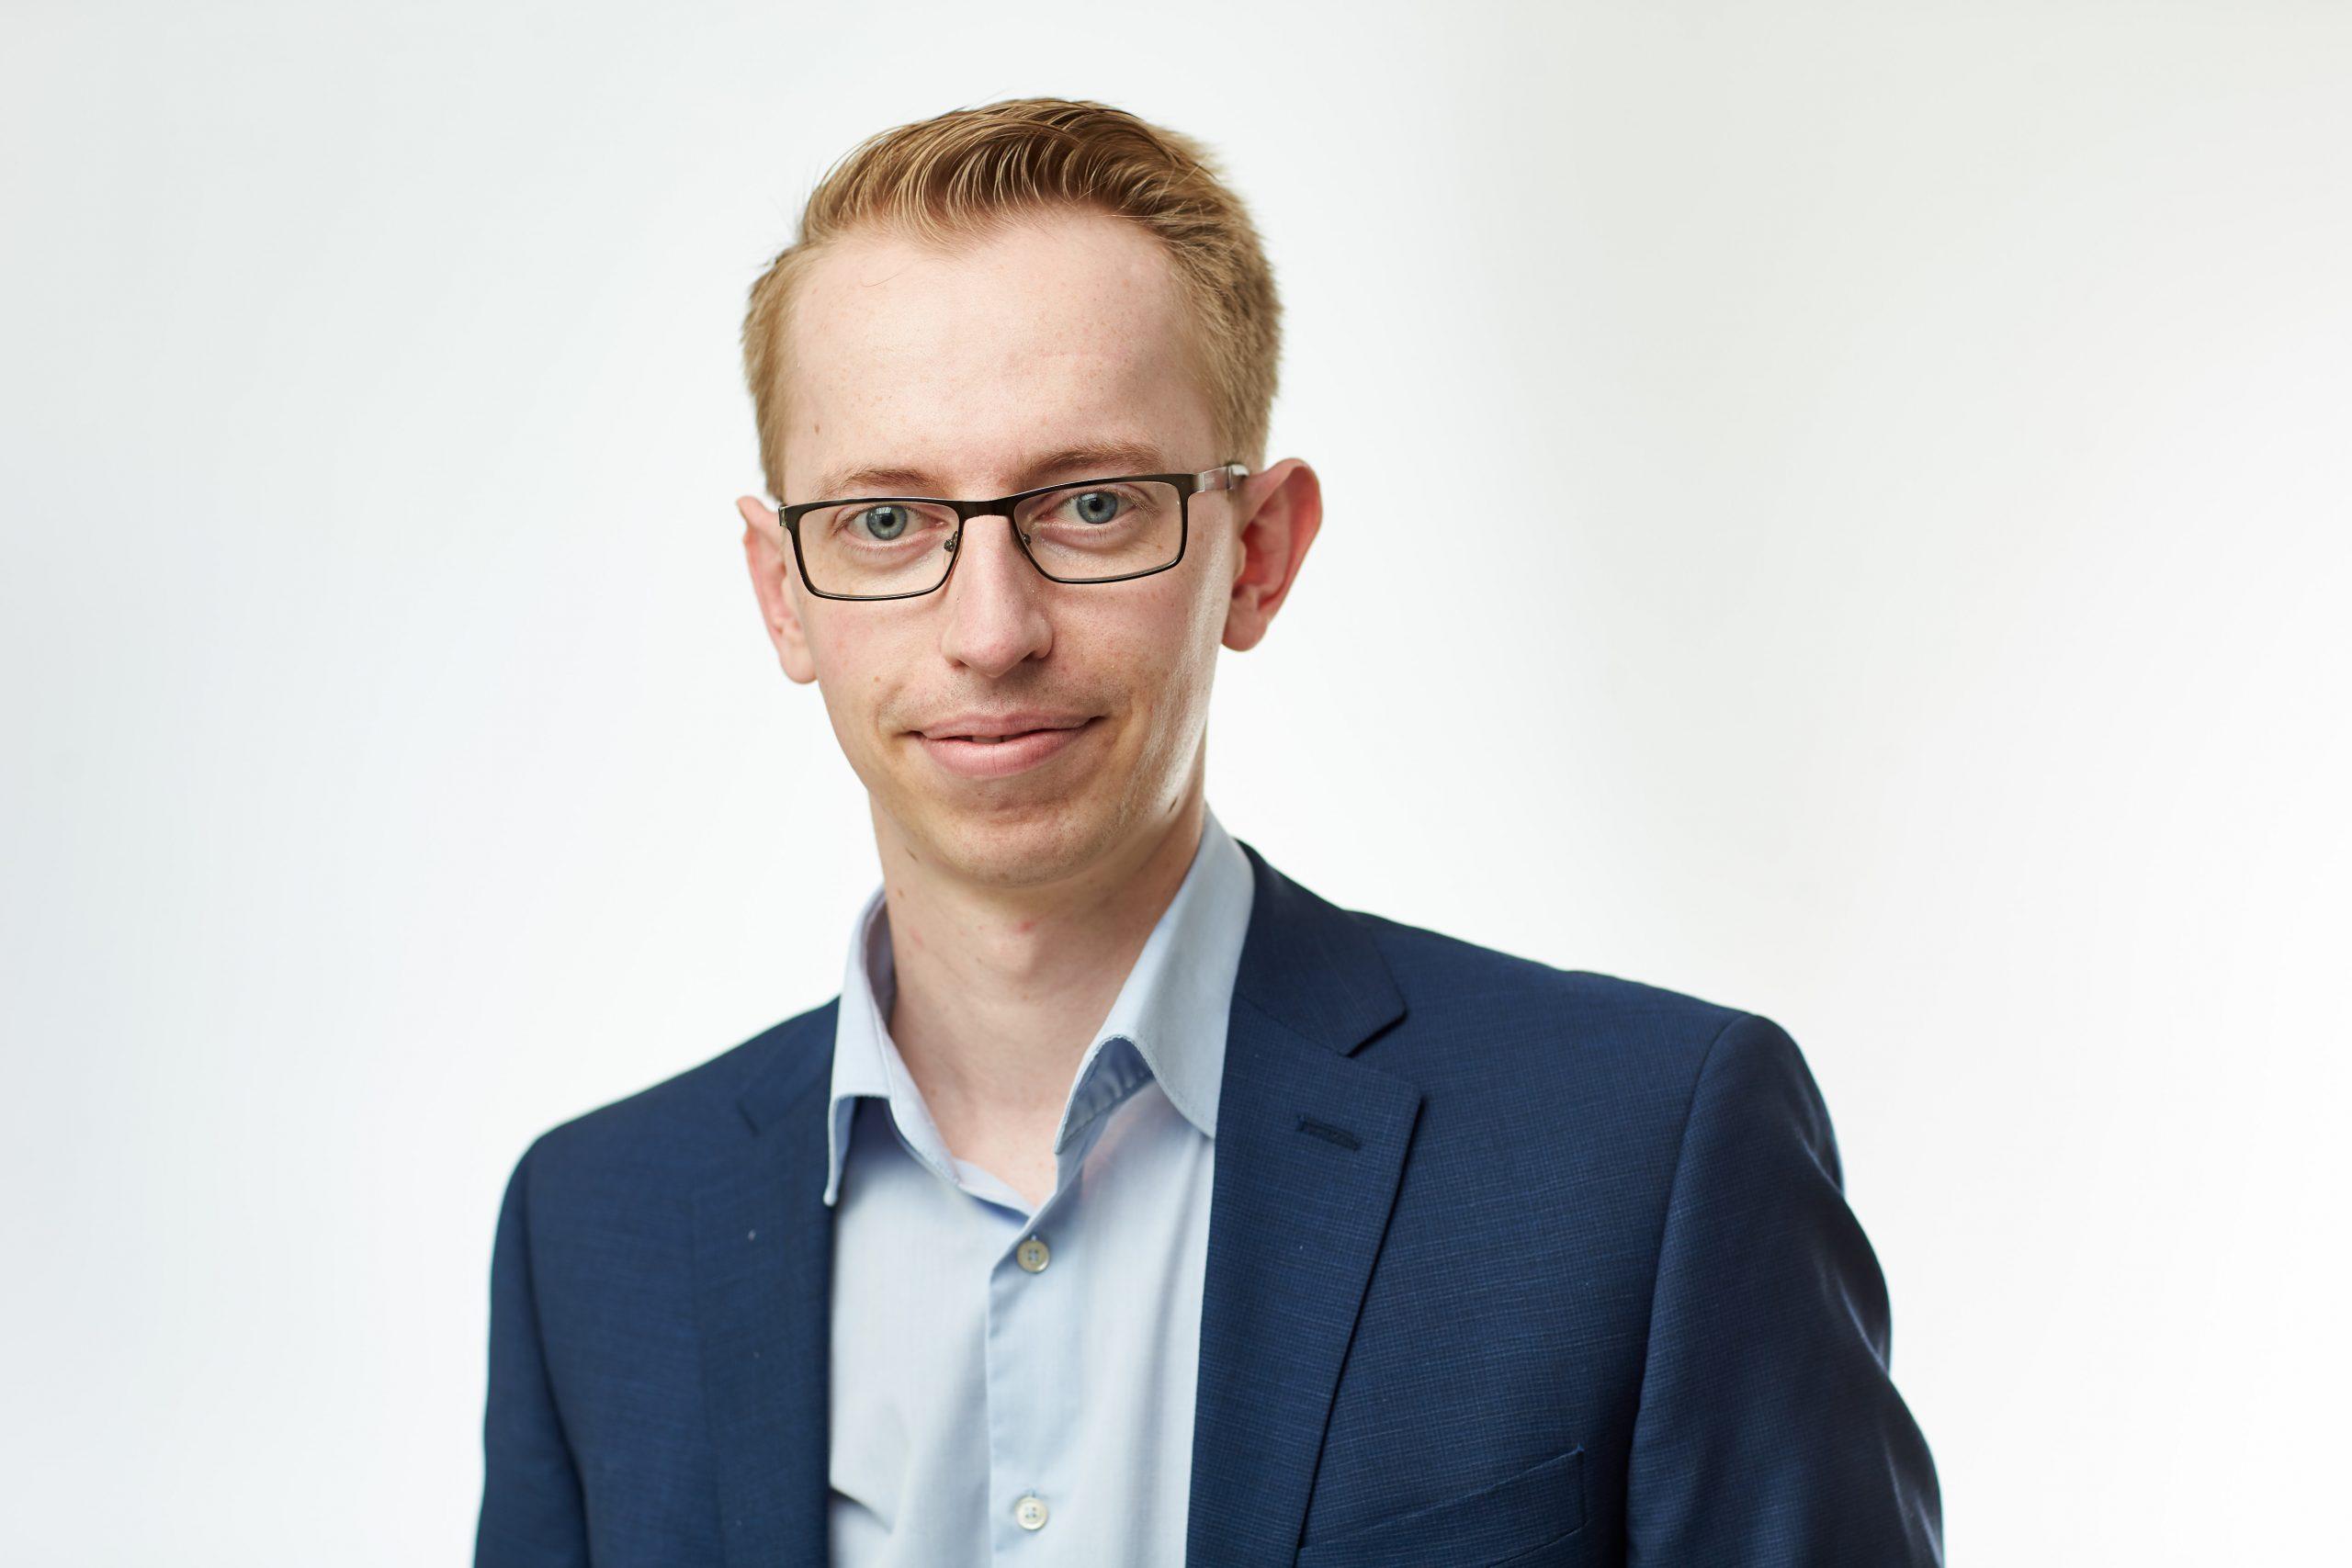 Tobias Pfauter